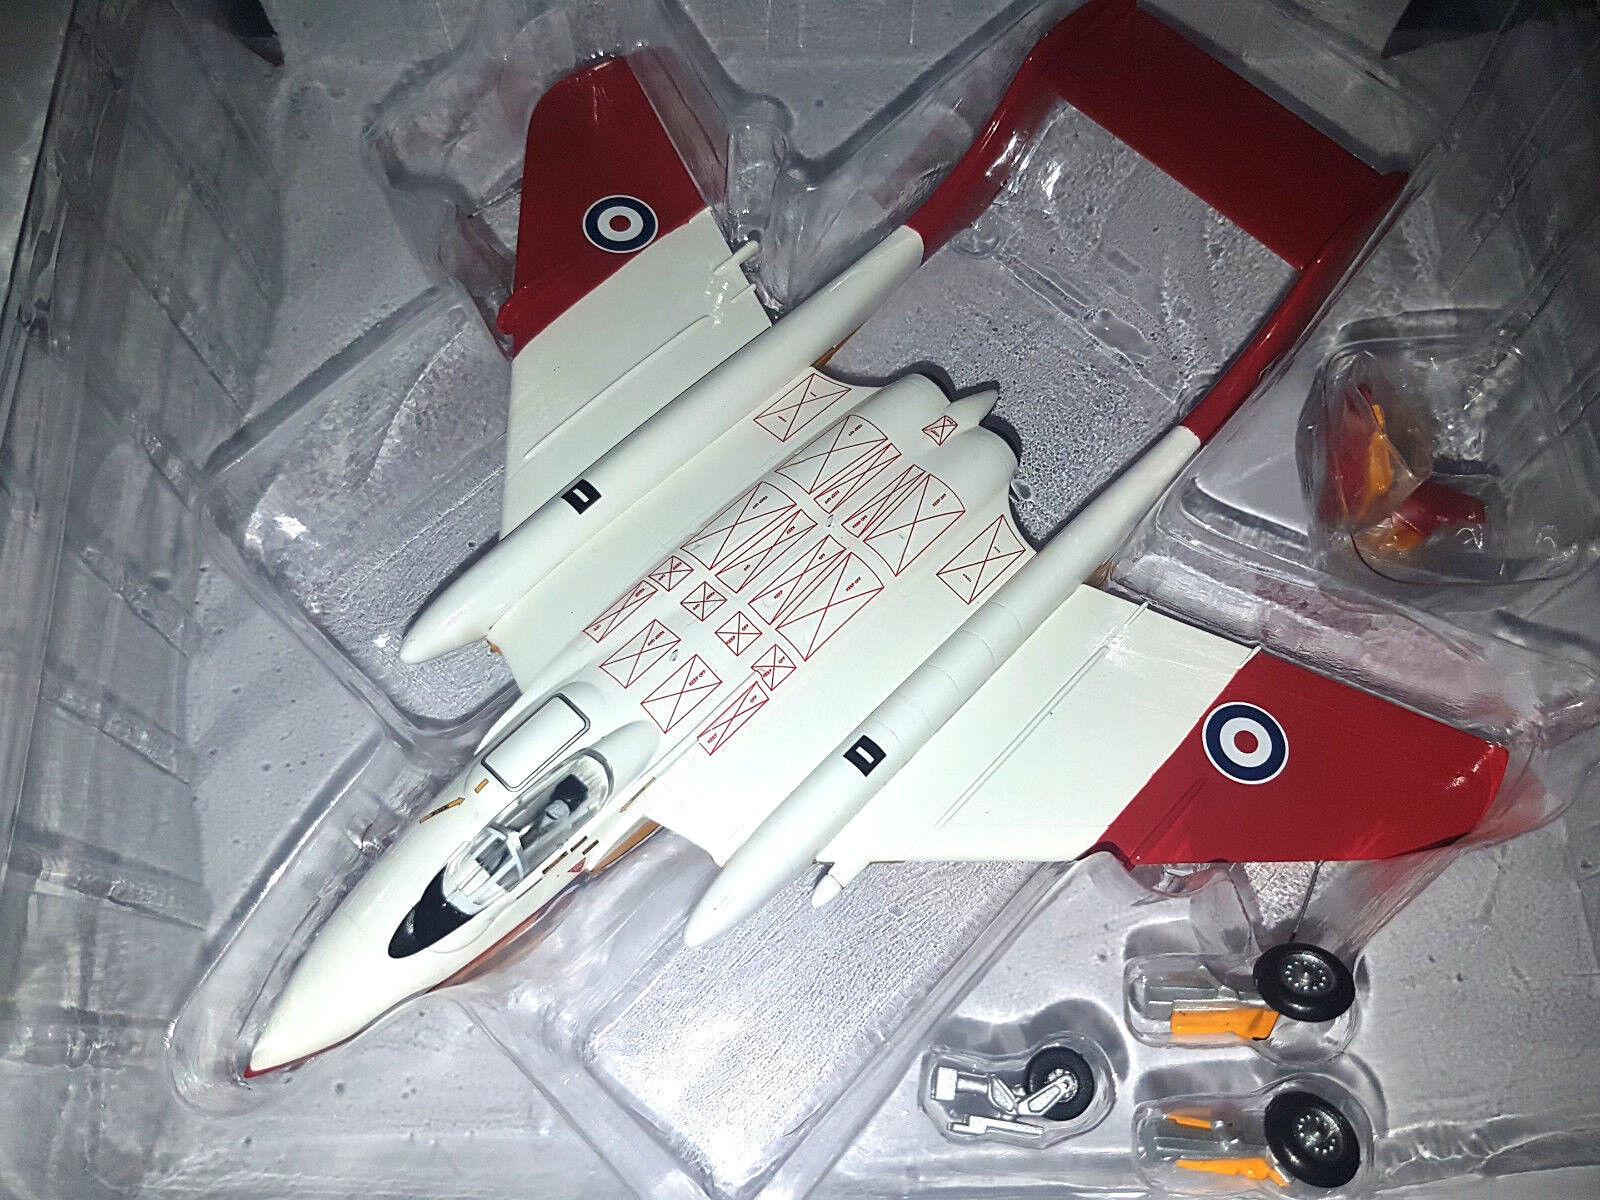 de Havilland Sea Sea Sea Vixen FAW 2 XS587 1984  Scala 1:72 Die Cast 72 Aviation Nuovo | La Reine De La Qualité  b77b55